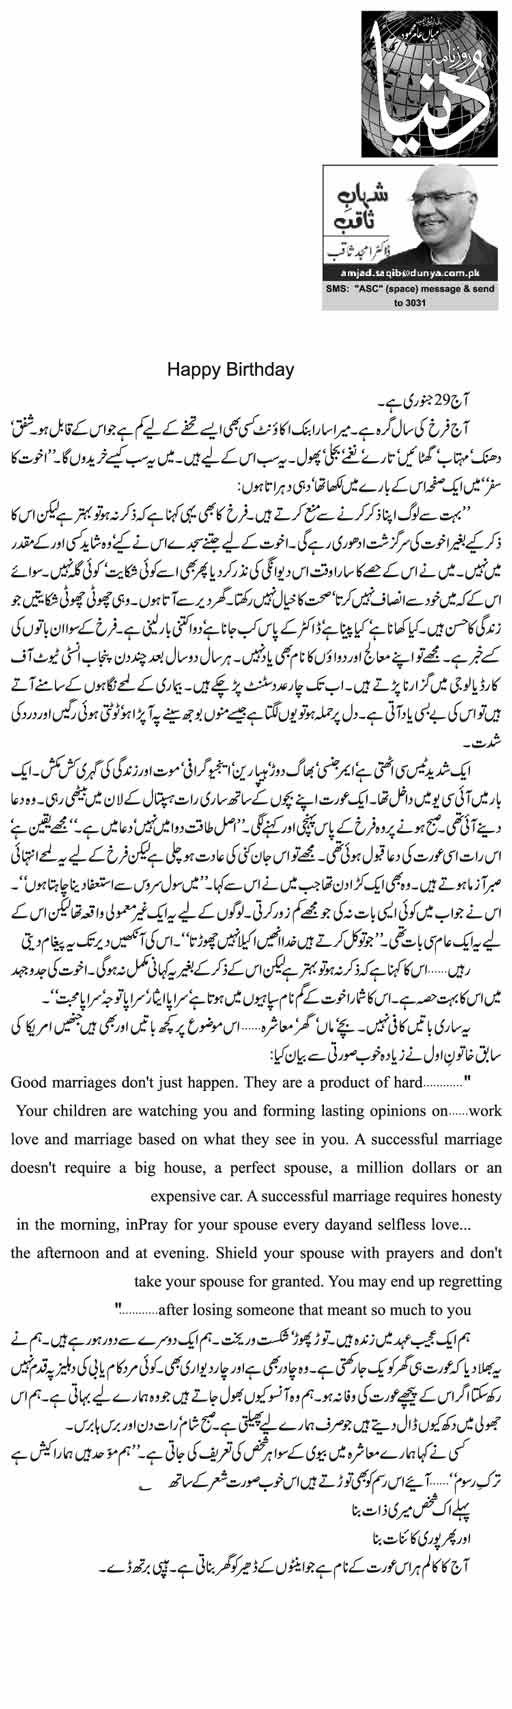 Happy Birthday | Dr. Amjad Saqib | Daily Urdu Columns